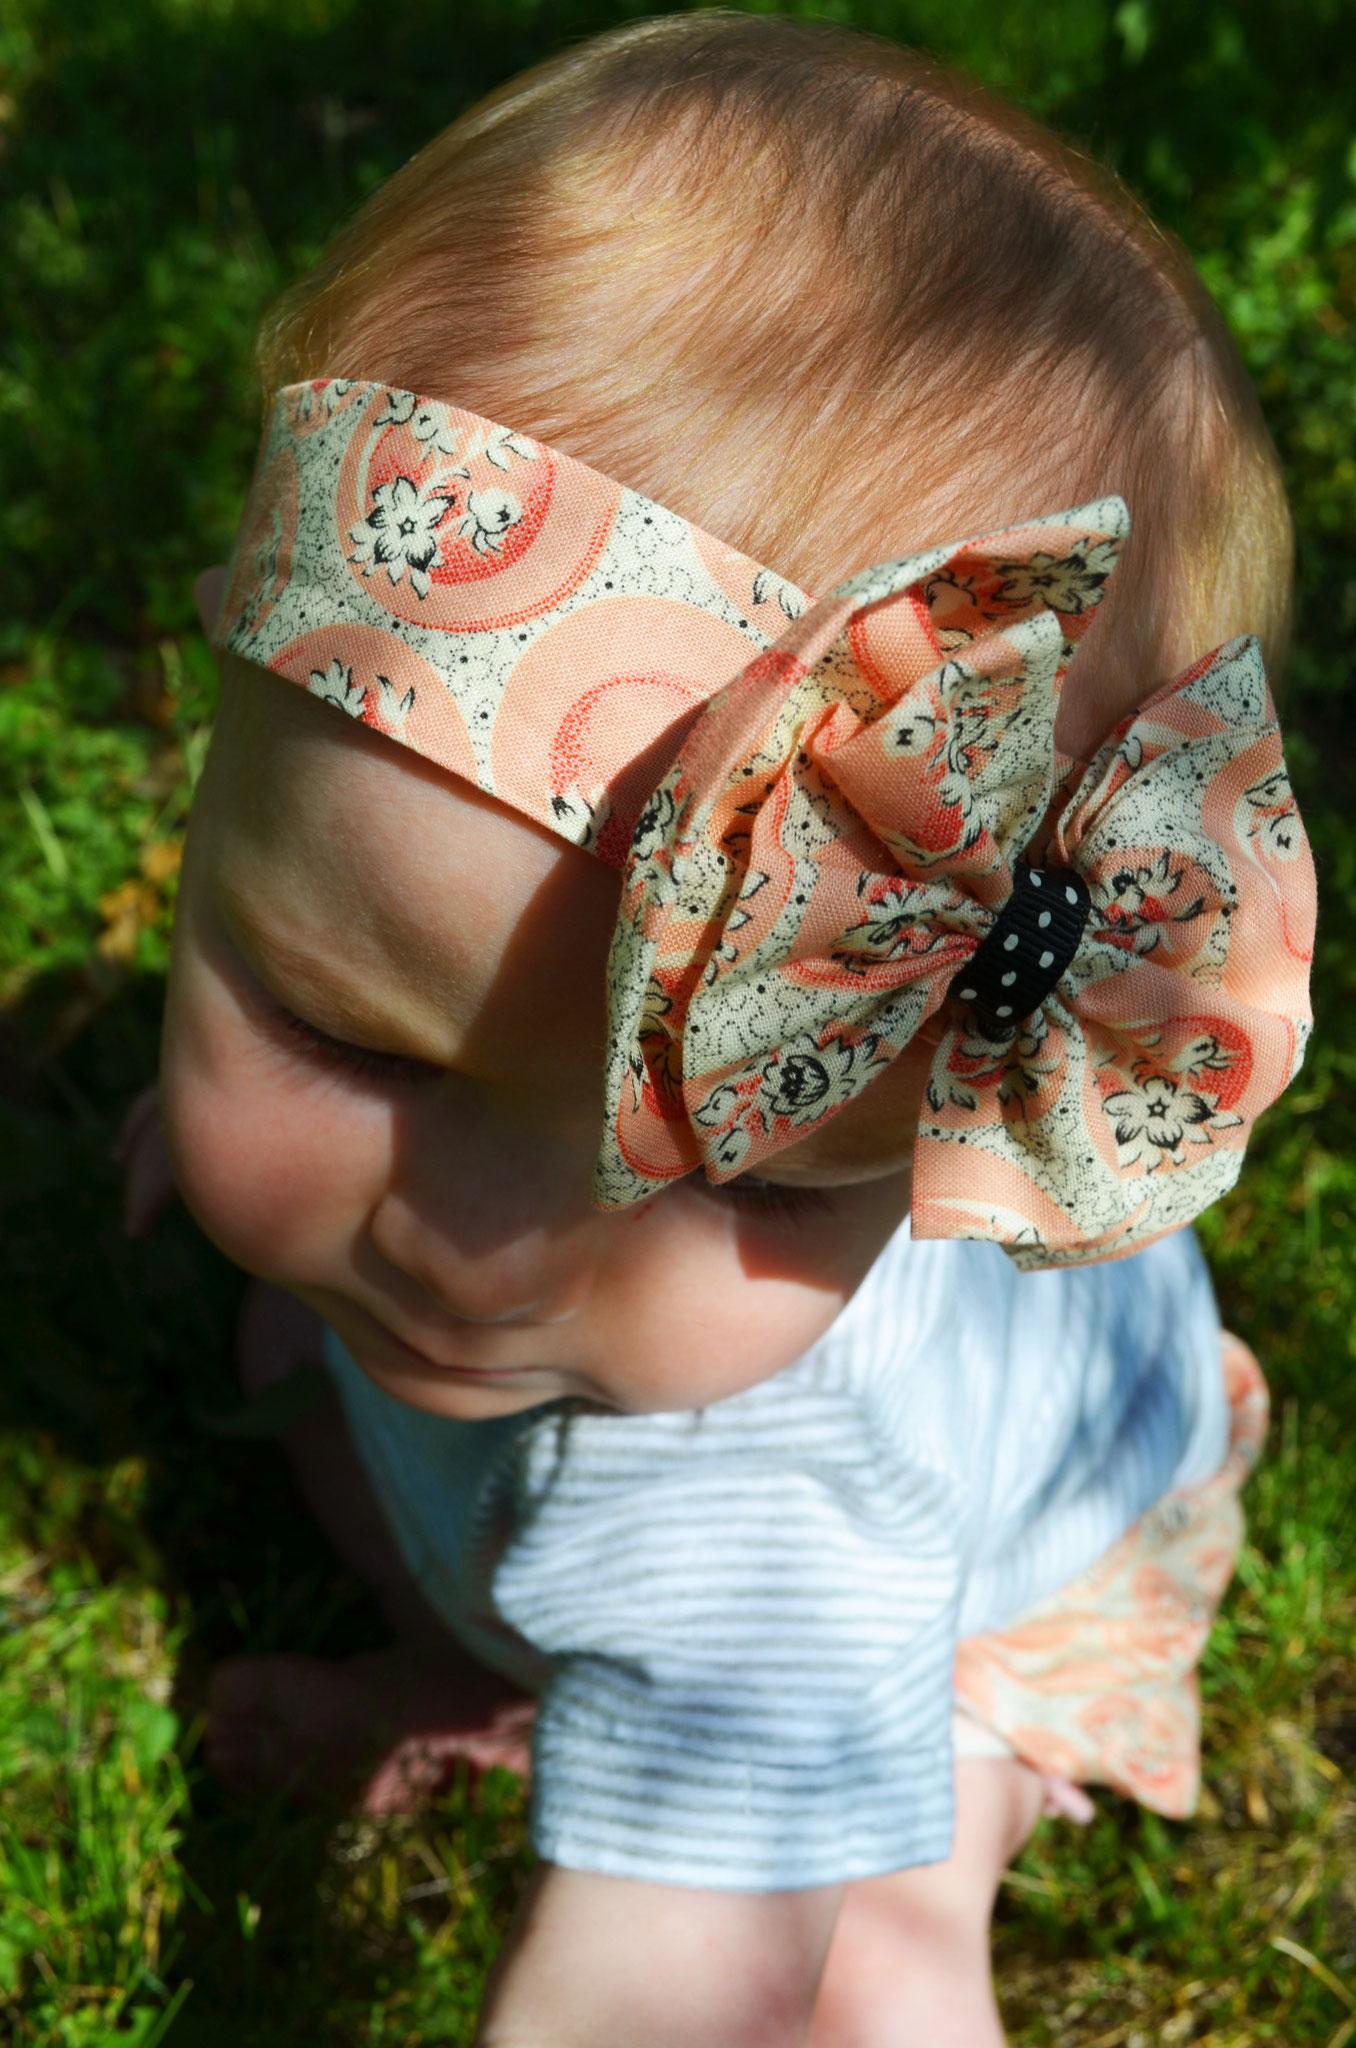 Headband with large bow